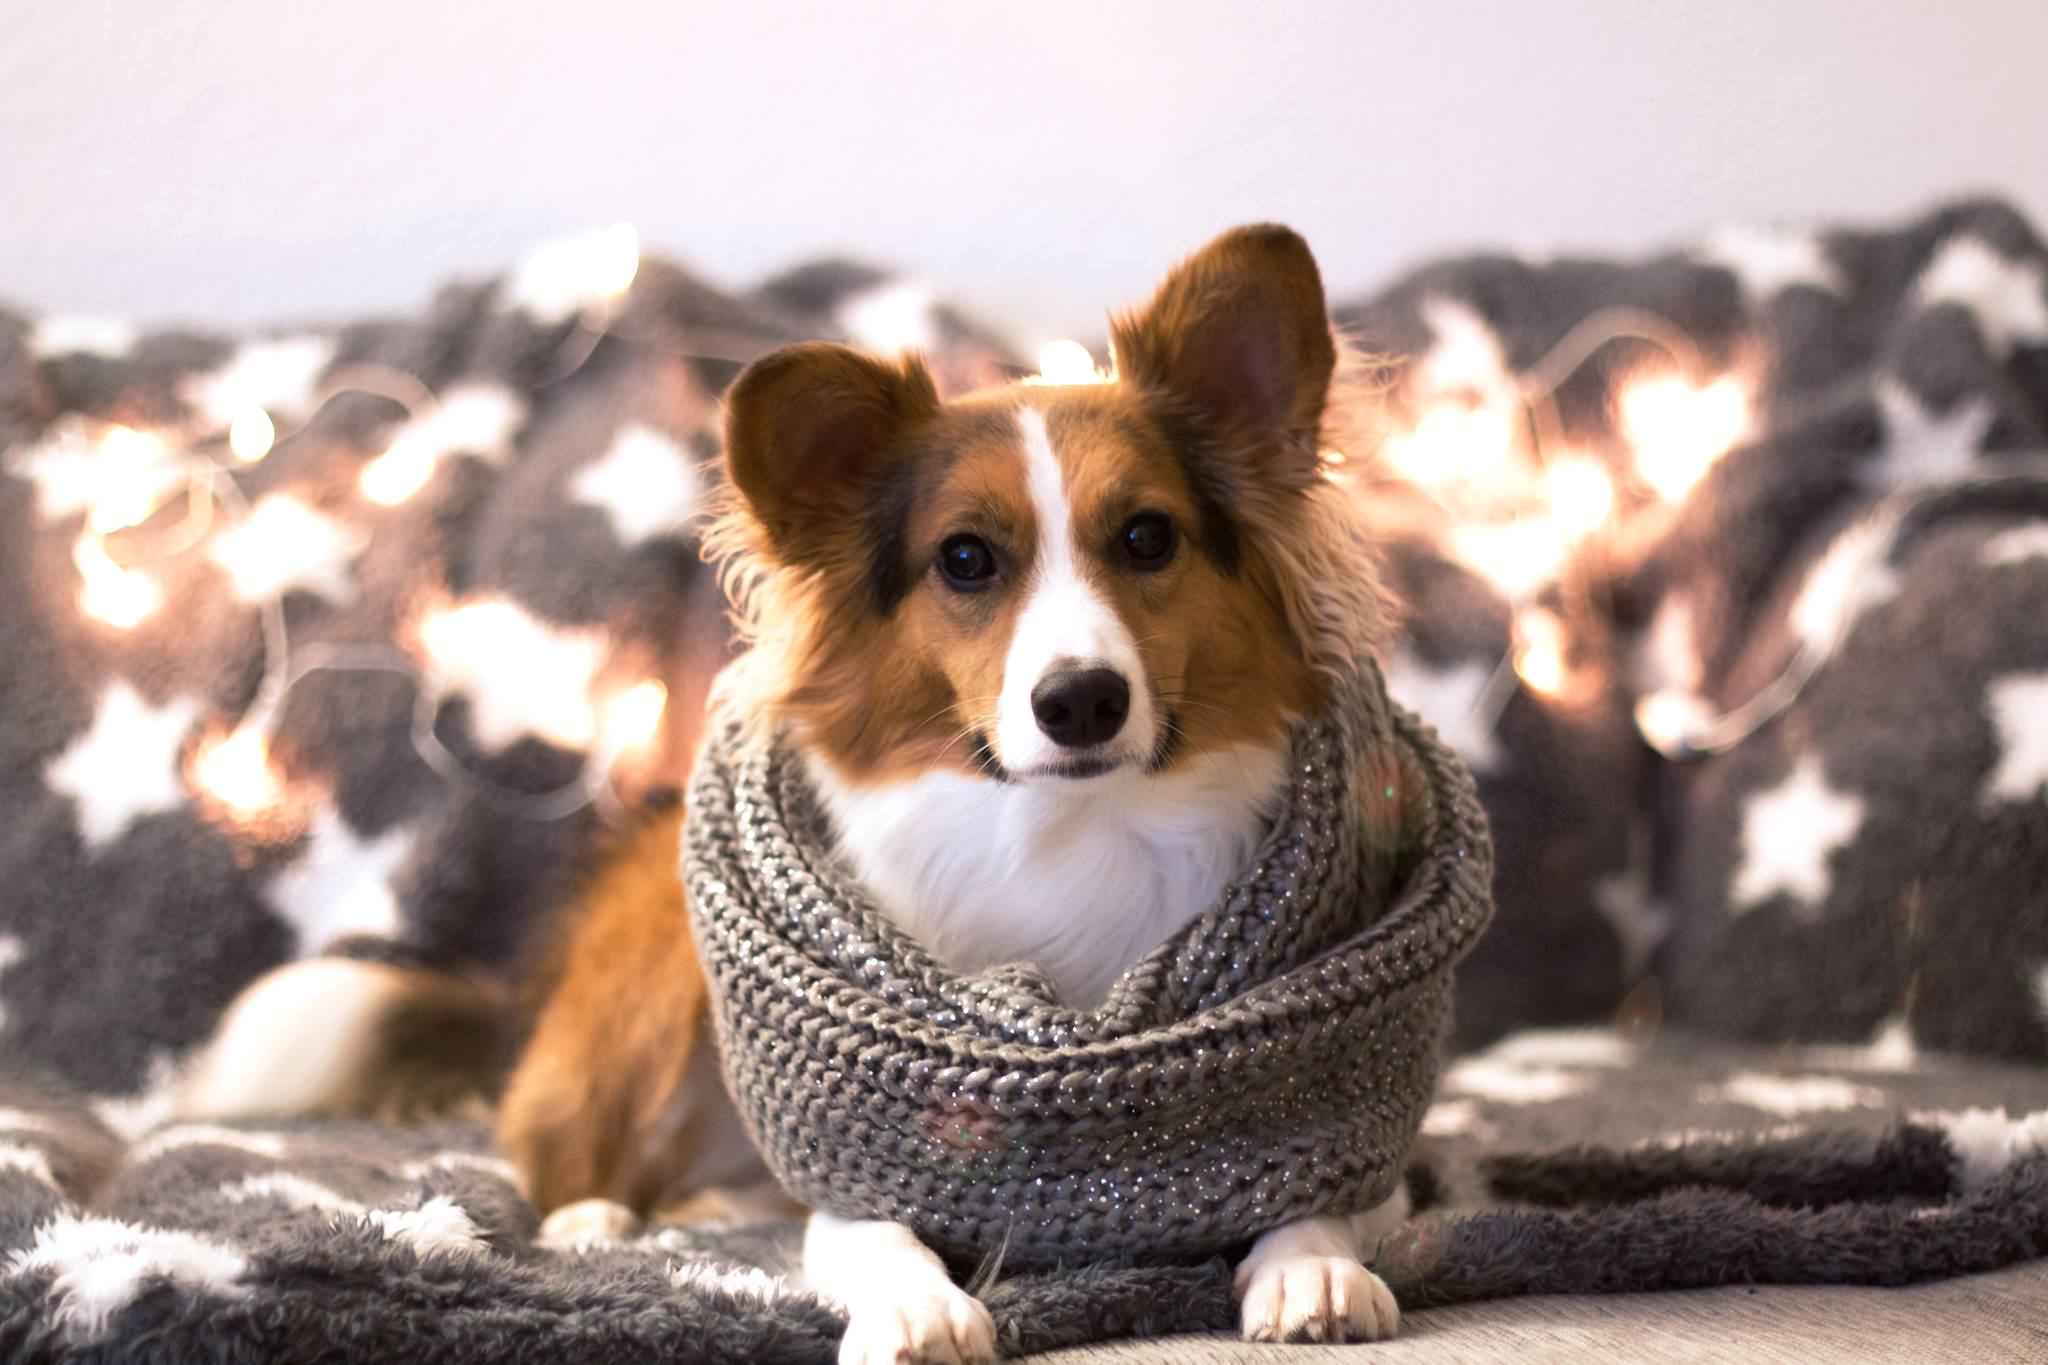 Leuchthalsbänder bei Hunden mit langem Fell